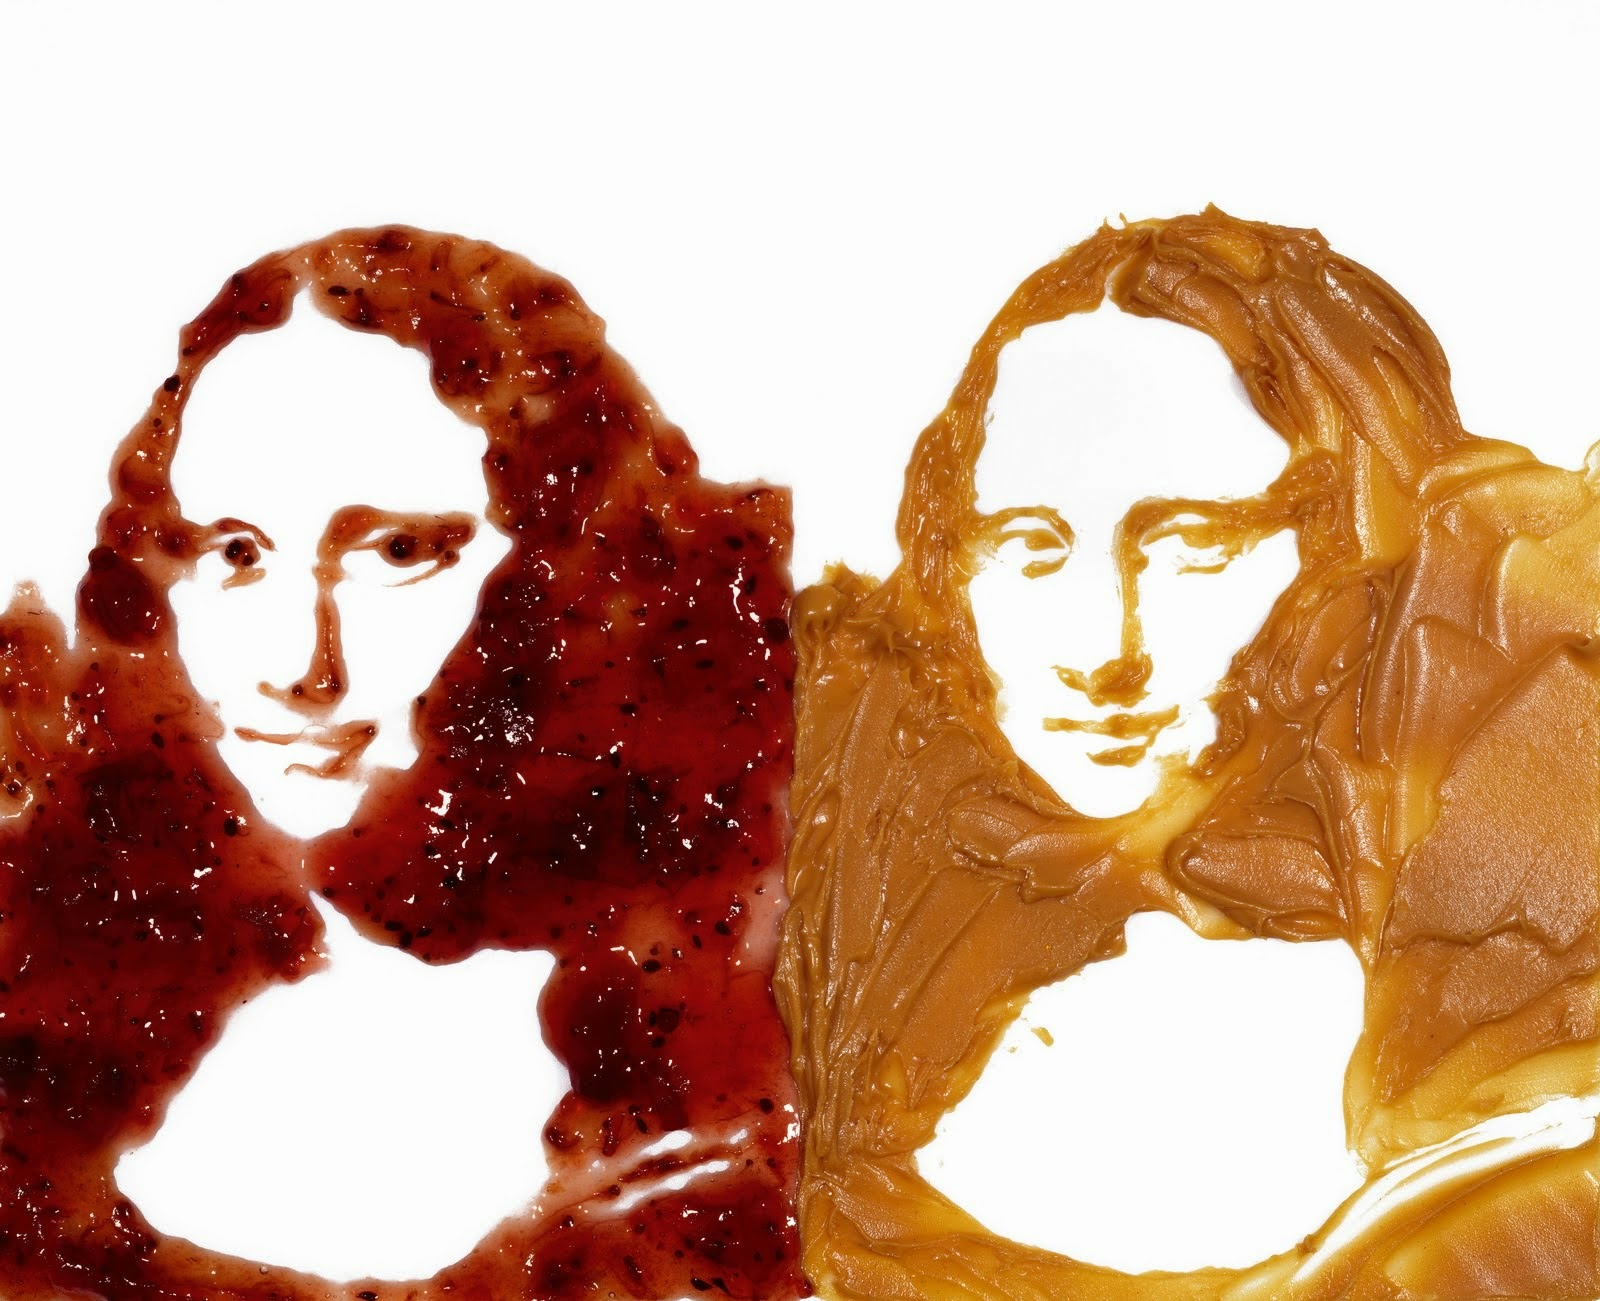 Double Mona Lisa, 2015 Vik Muniz